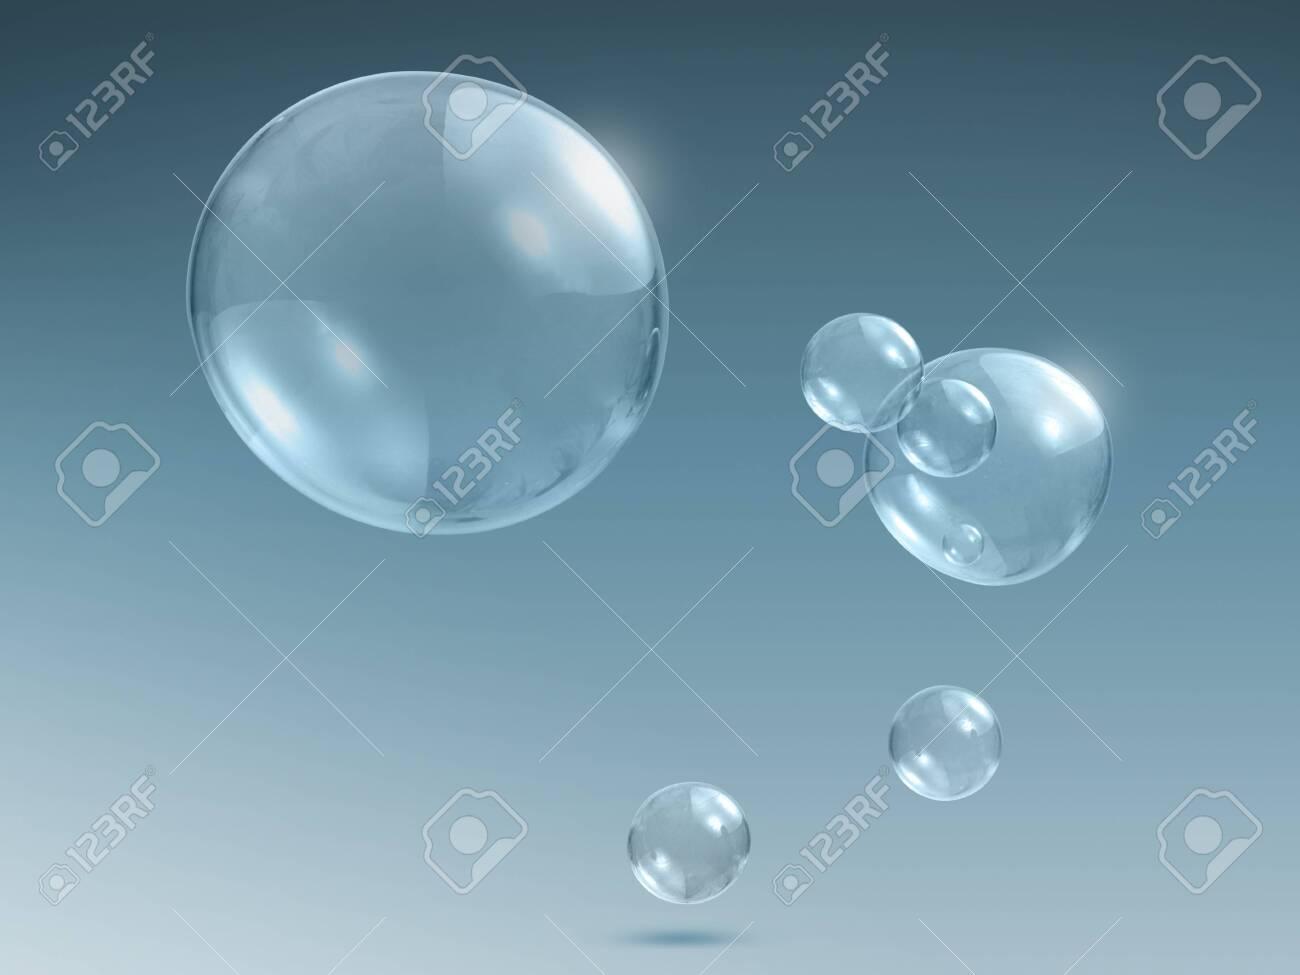 Transparent soap or water bubbles - 128563486